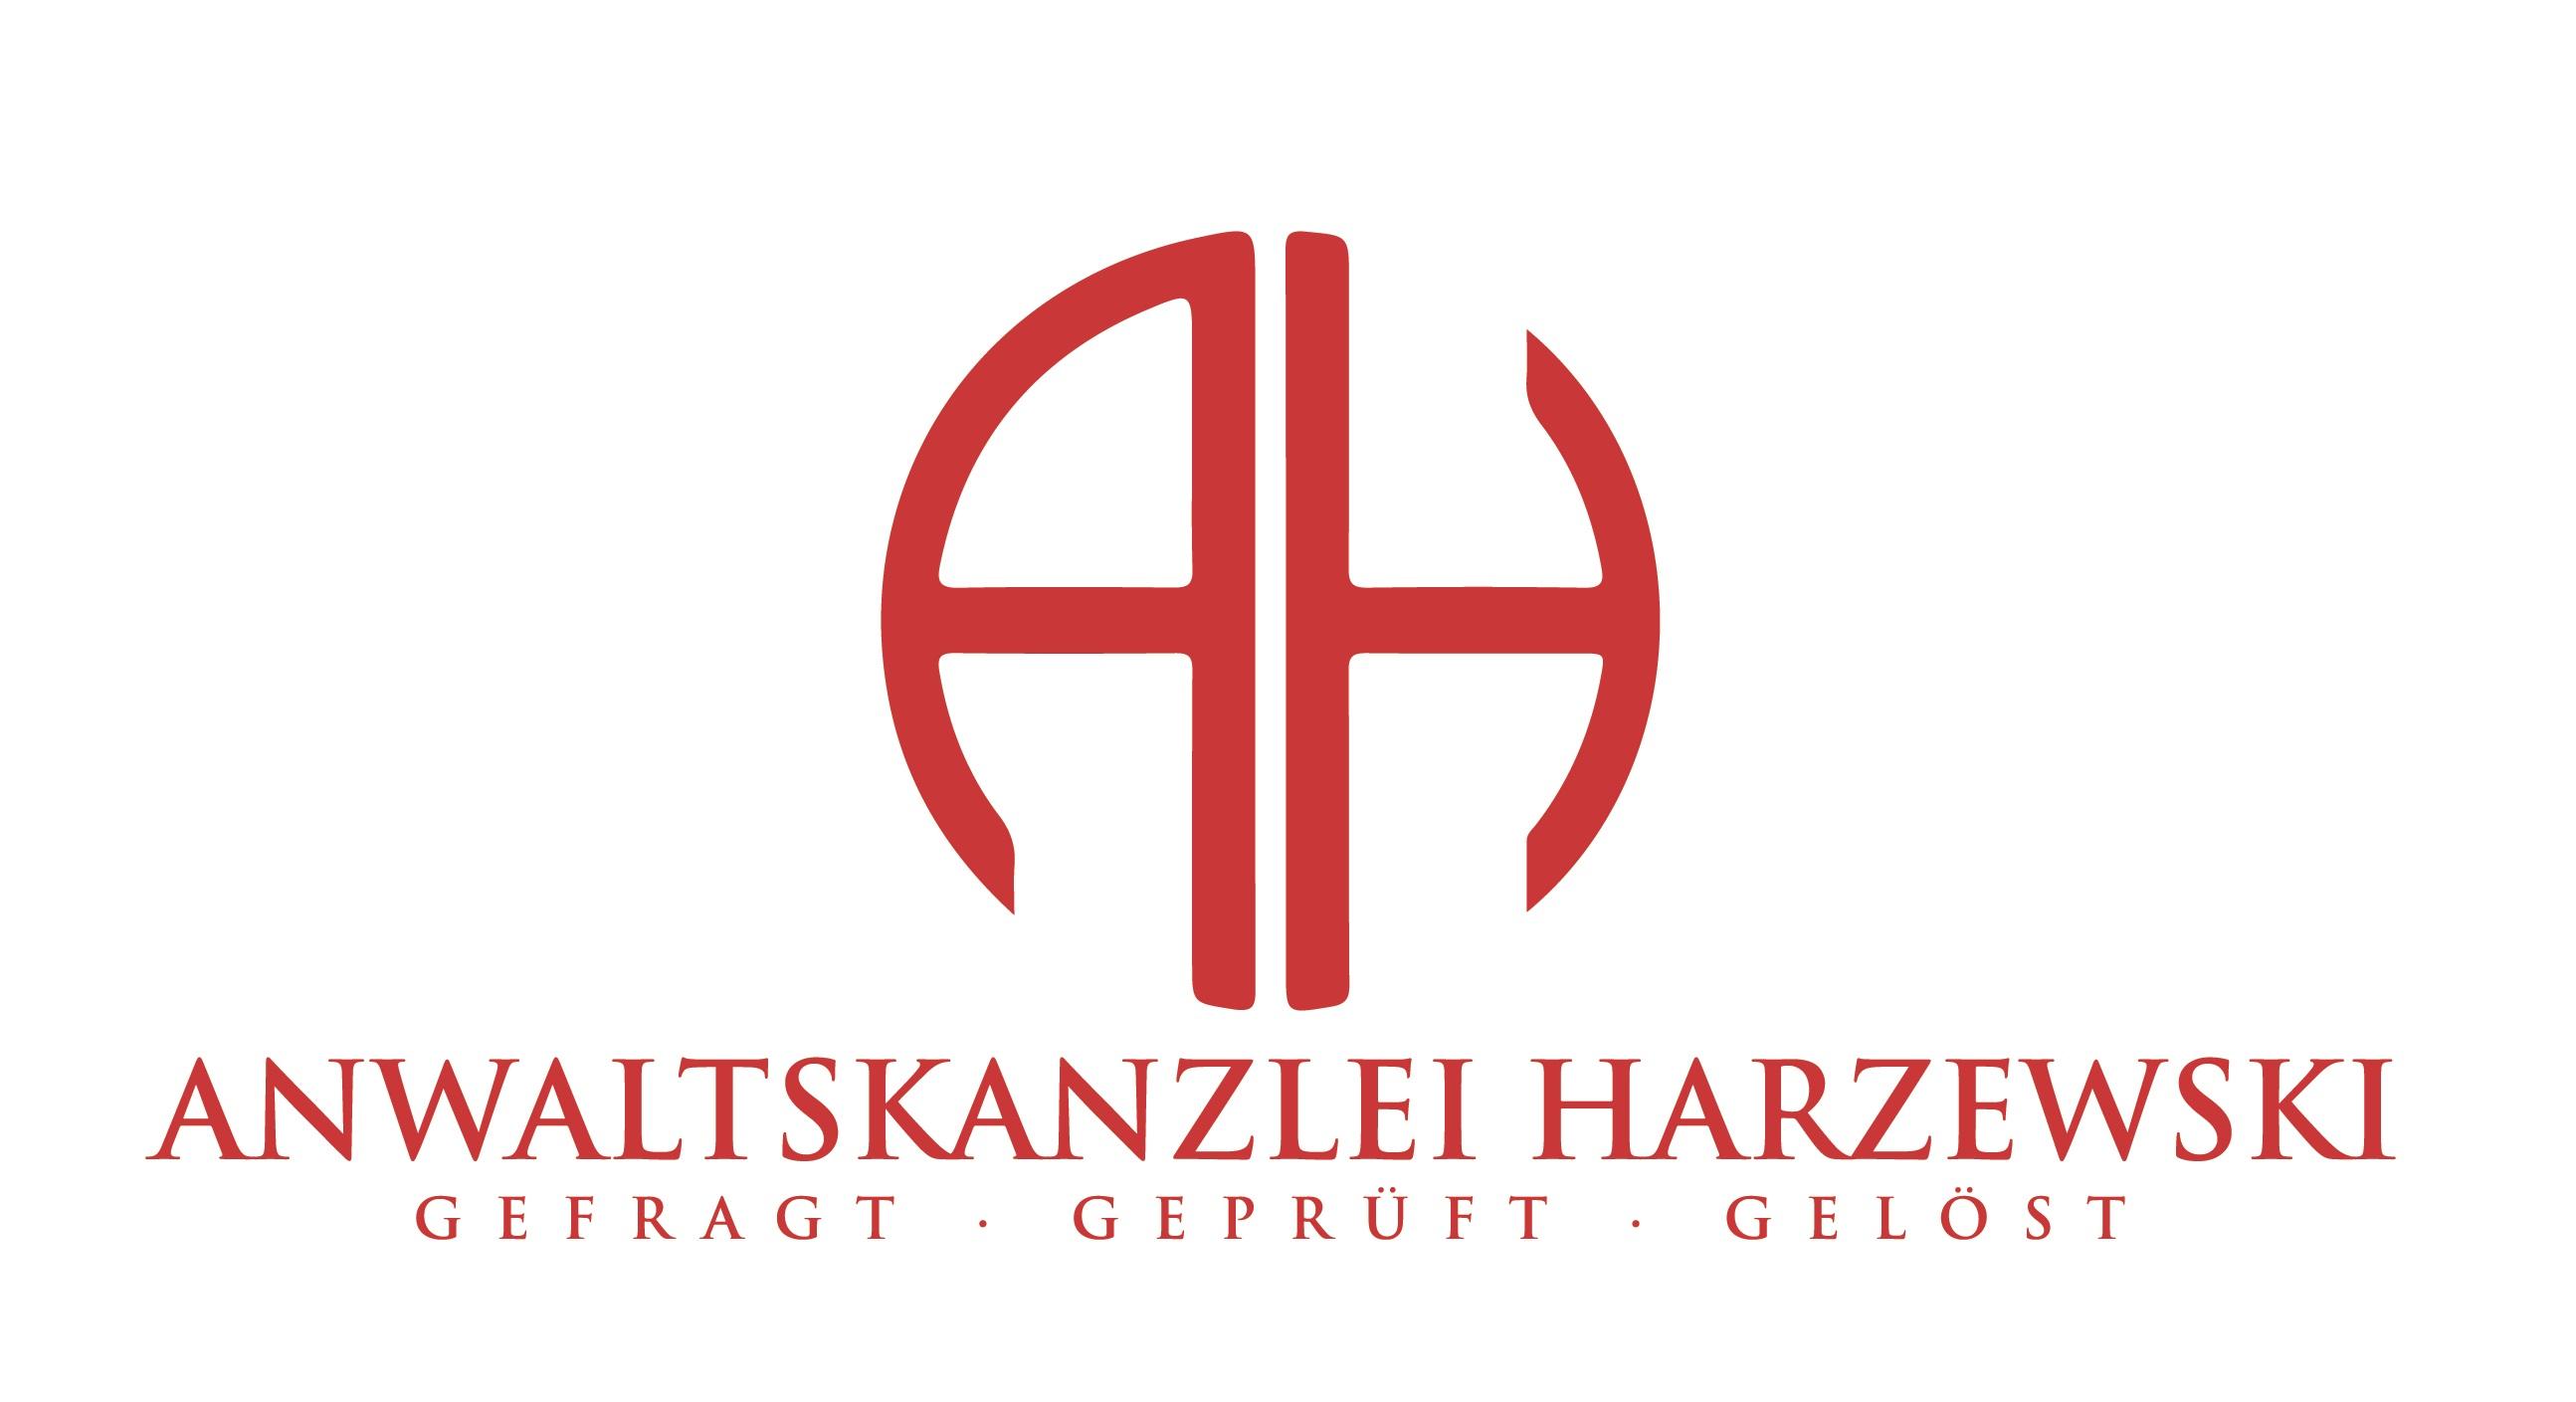 Anwaltskanzlei Harzewski Dresden Königsbrücker Landstraße 5